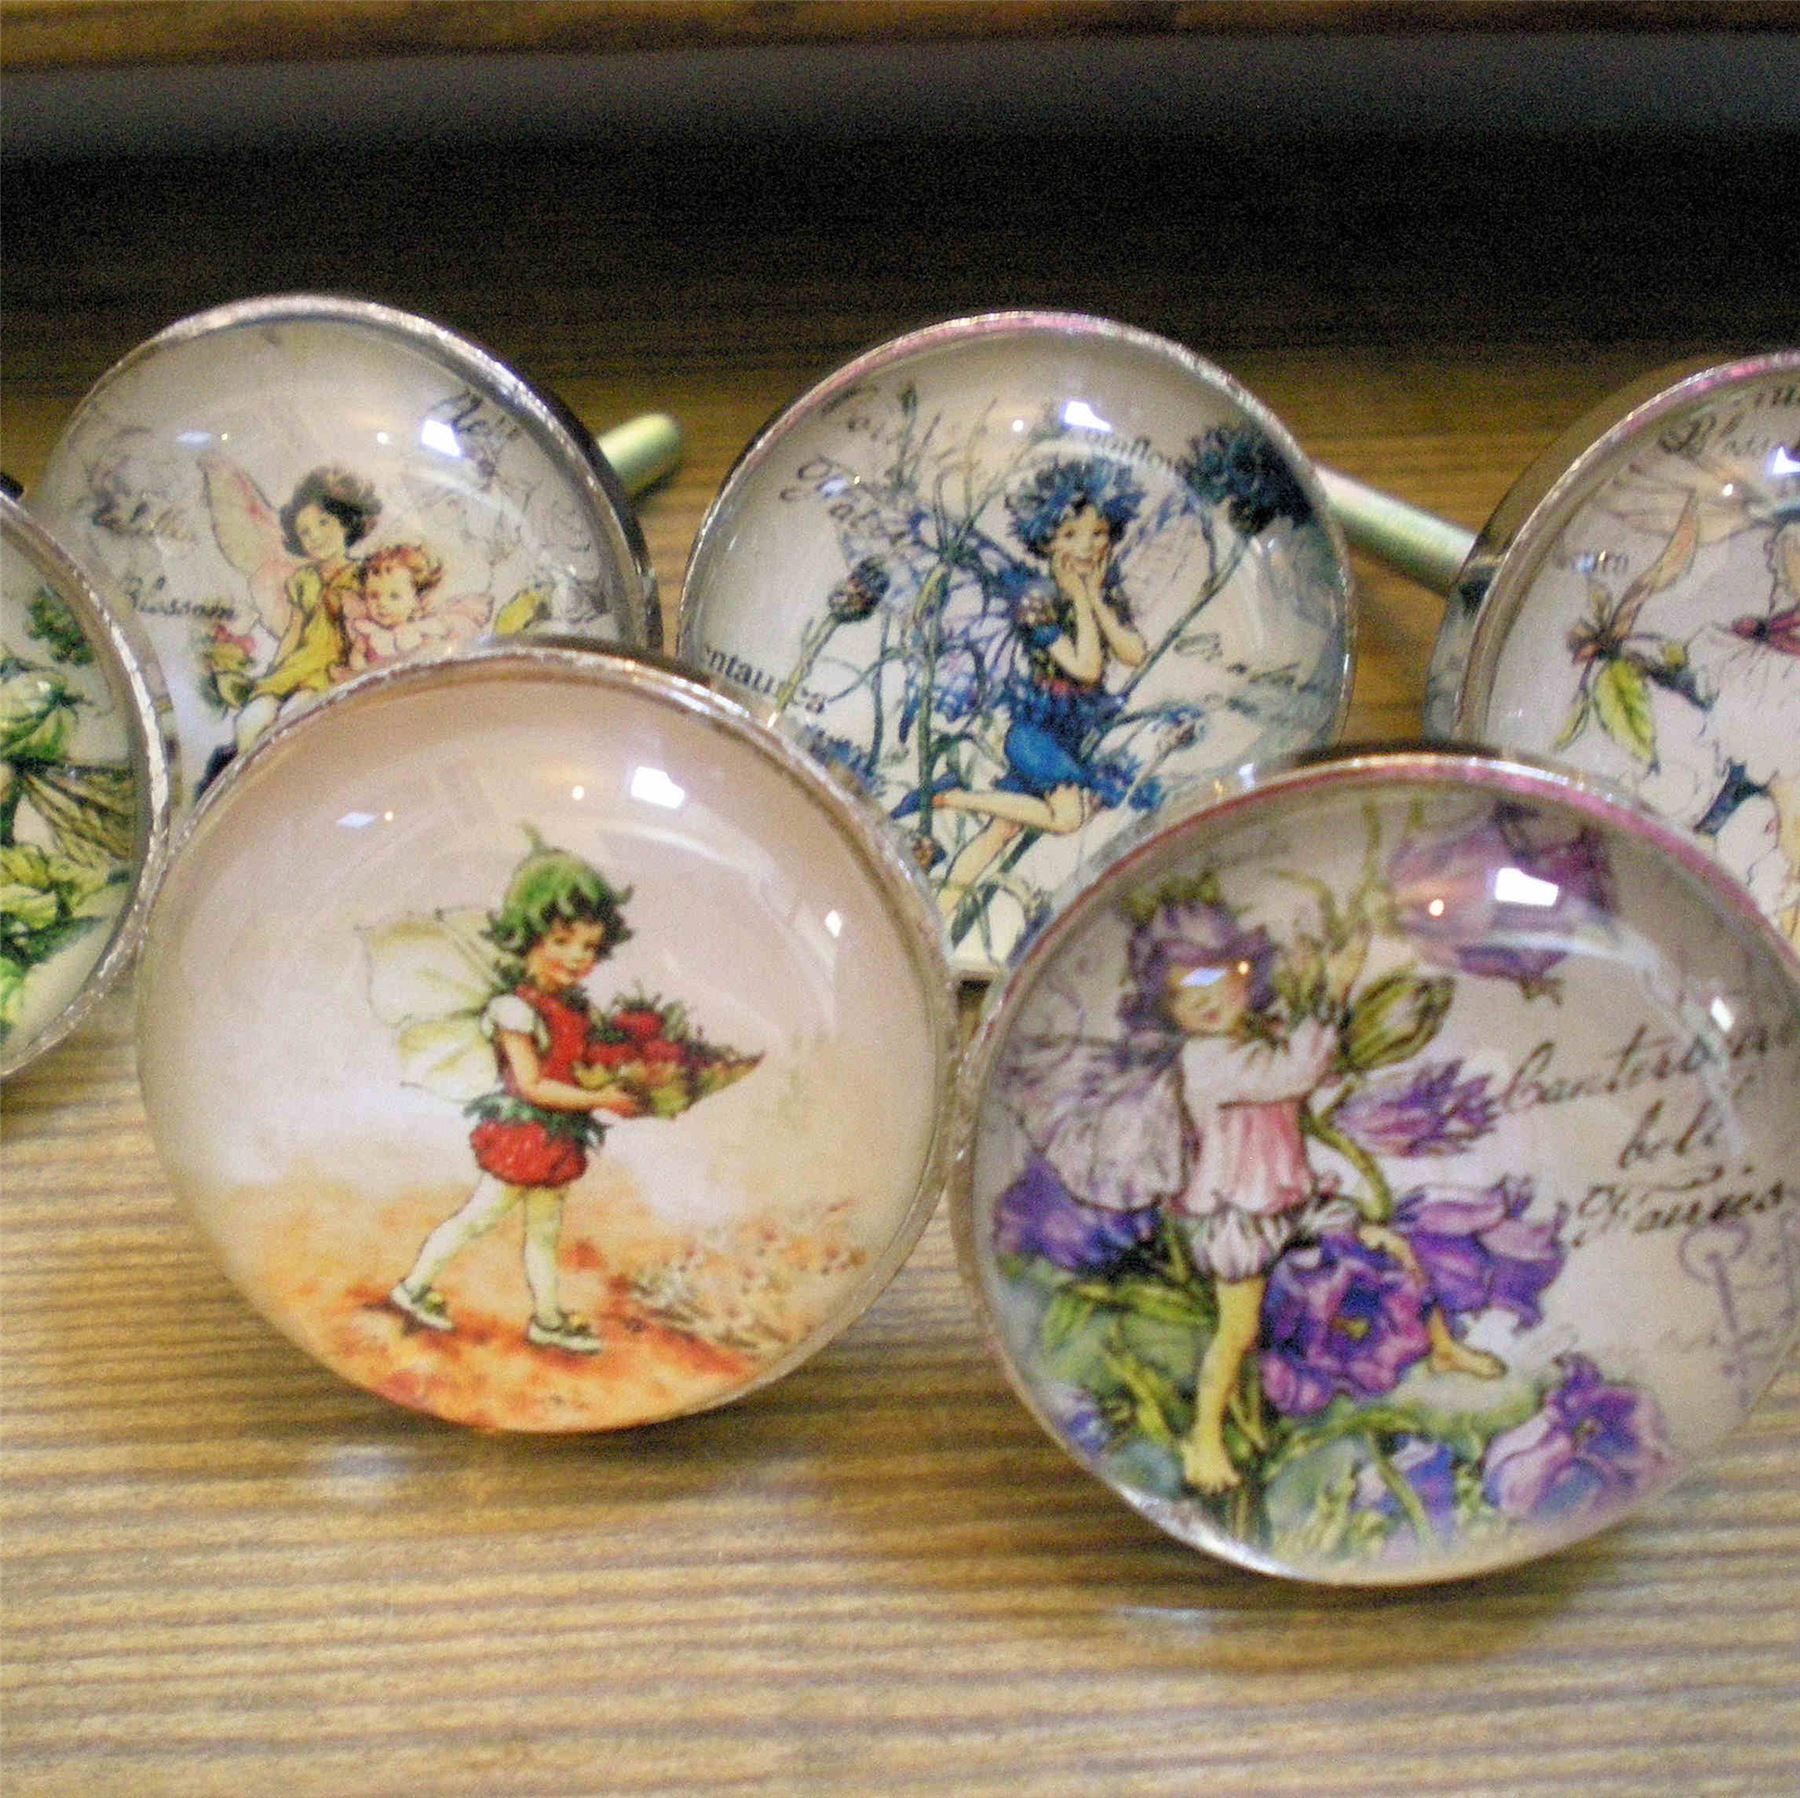 Flower Fairy Glass Door Knobs Girls Bdrm Furniture Drawer Pulls Handles Fairies